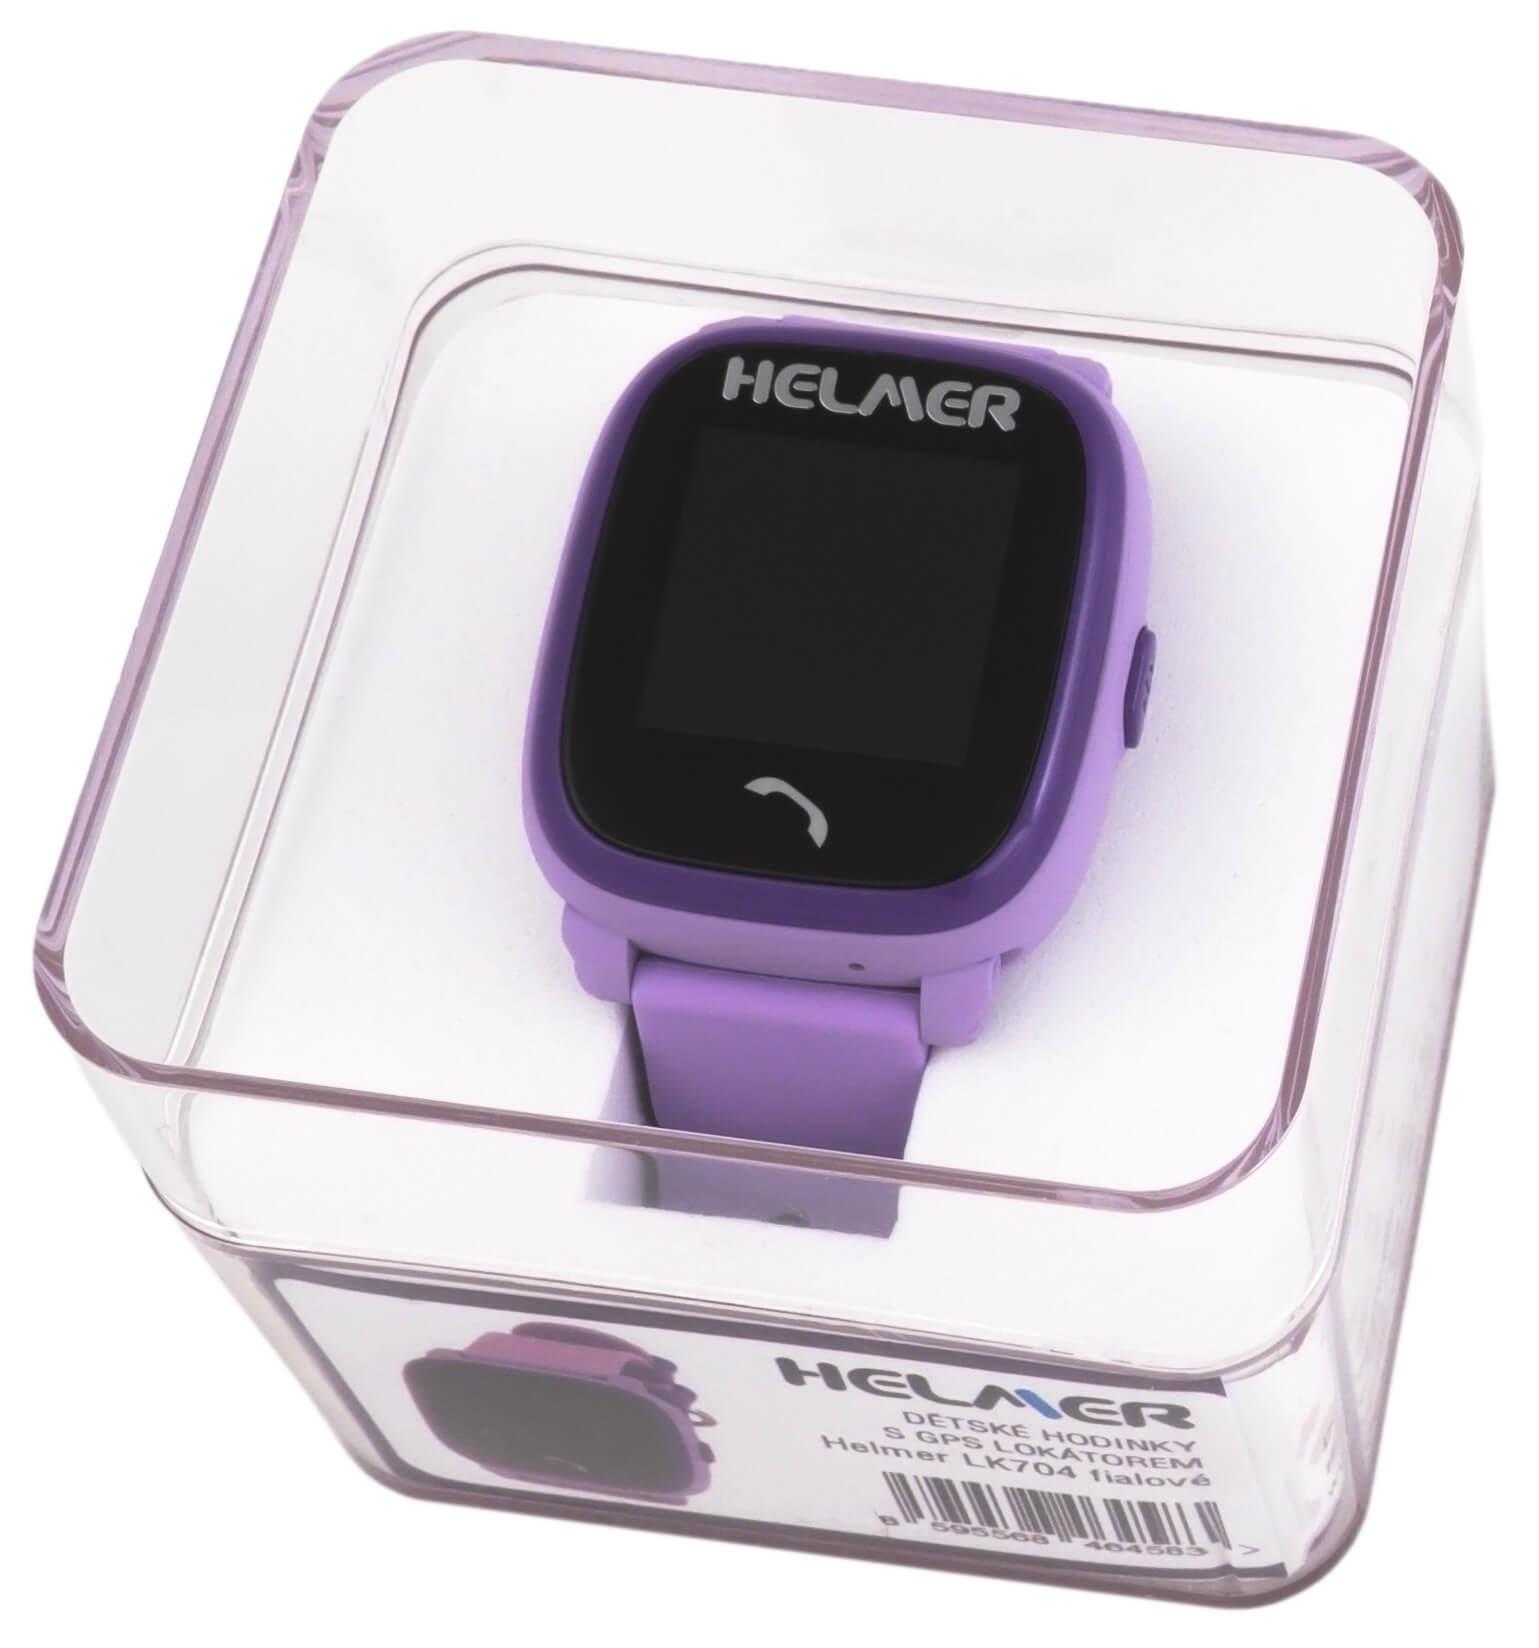 Helmer Chytré dotykové vodotěsné hodinky s GPS lokátorem LK 704 fialové e344ee4ea7